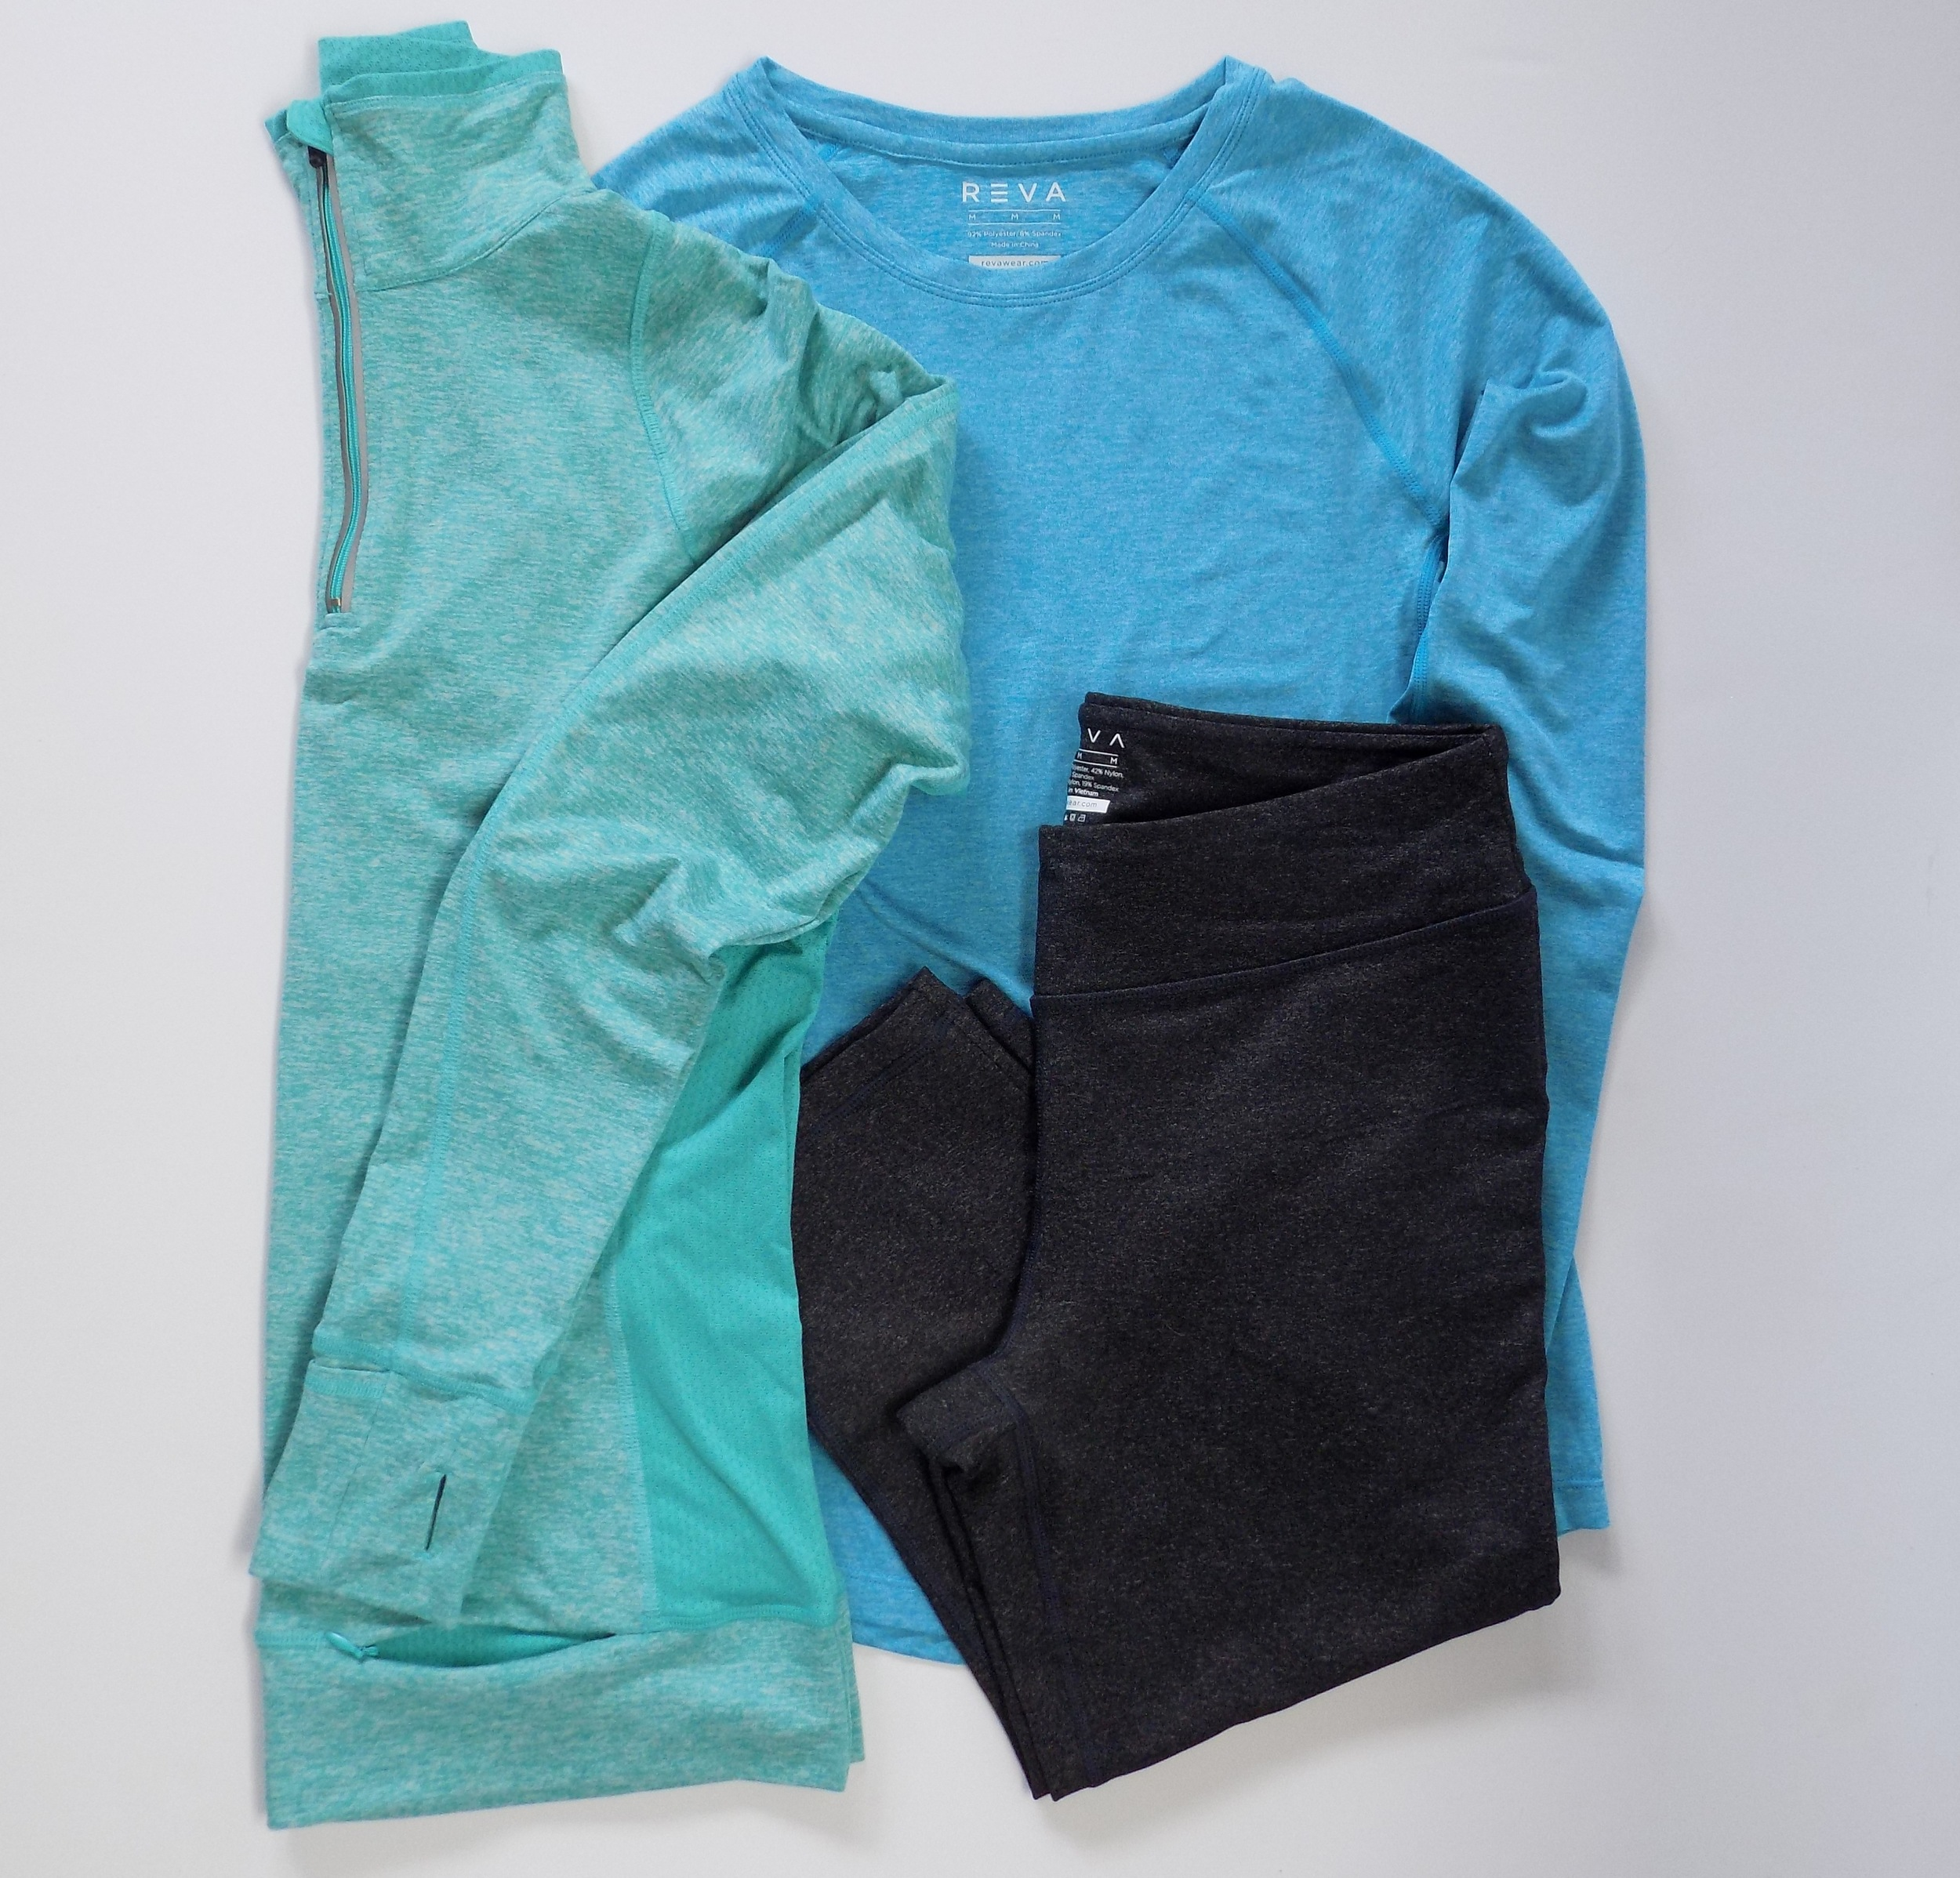 Reva Wear's Inspire Me Jacket, Challenge Me Long Sleeve Tee & Vitality Capri